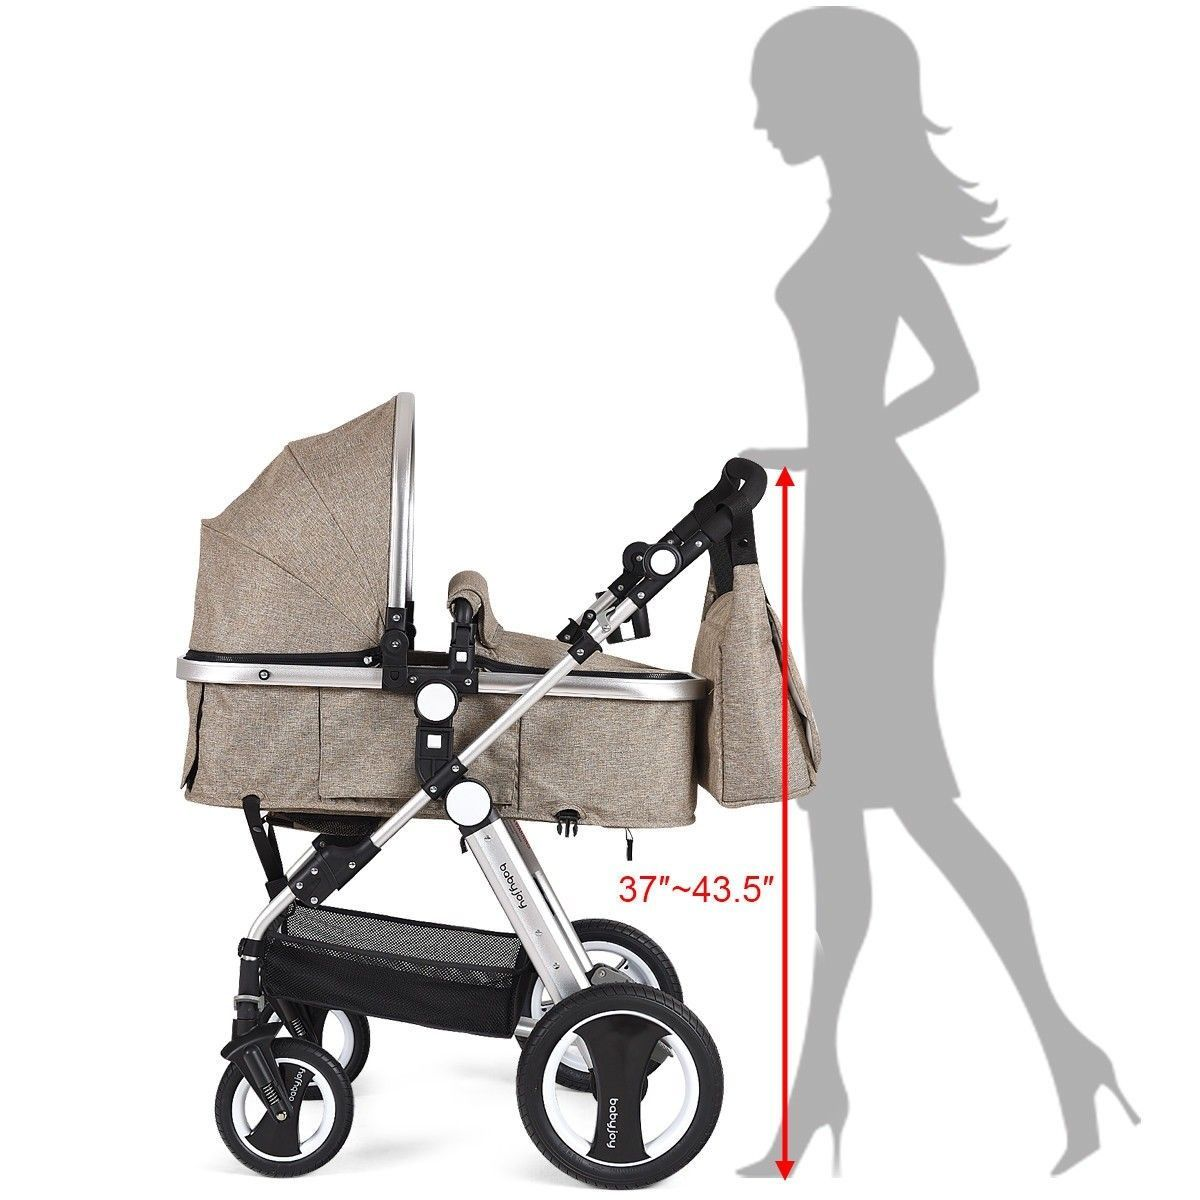 Best Compact Double Stroller in 2020 Top 5 Models